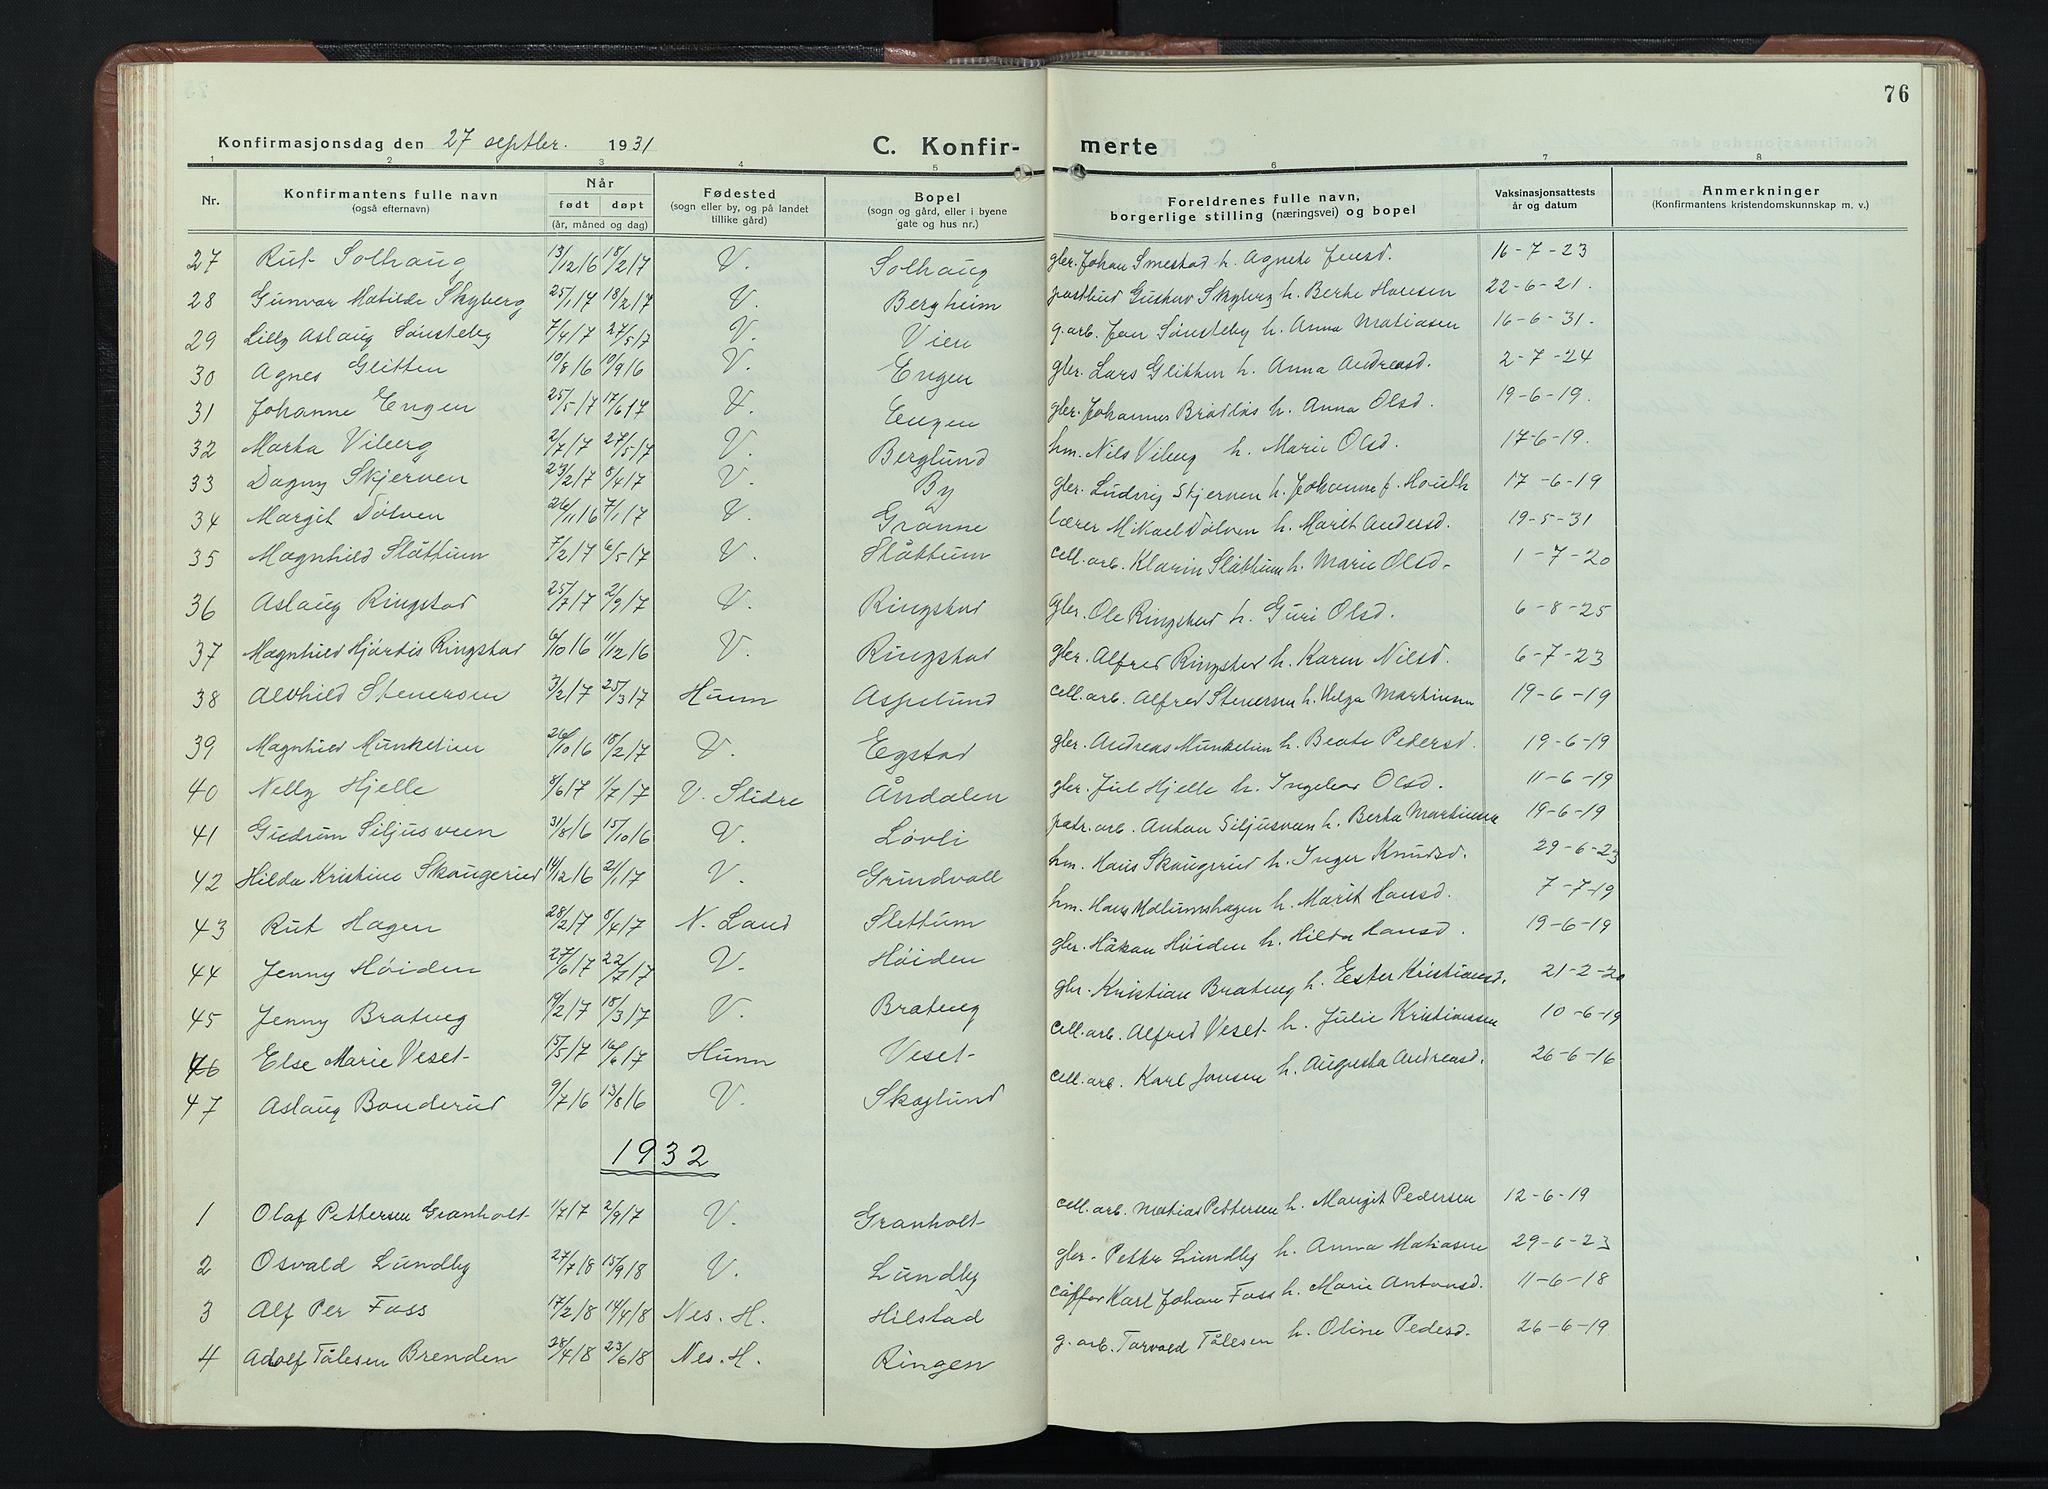 SAH, Vardal prestekontor, H/Ha/Hab/L0018: Klokkerbok nr. 18, 1931-1951, s. 76